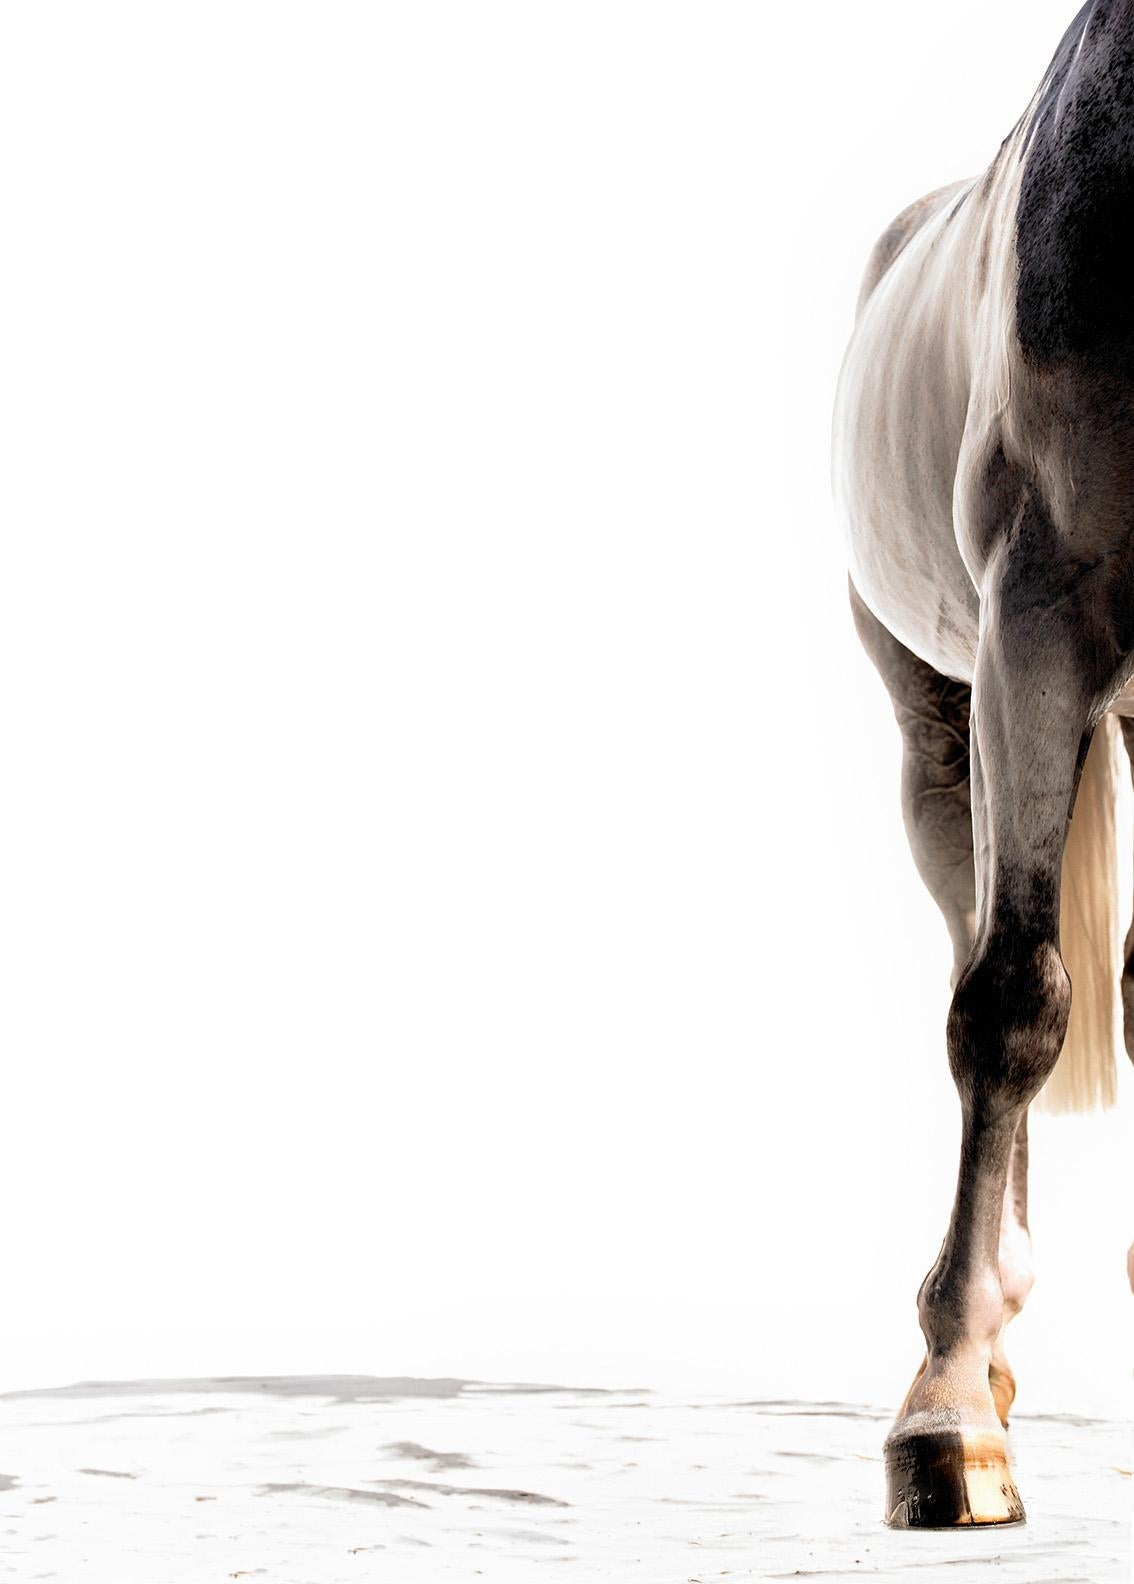 Koredo, Equine Fine Art Photography, Print Only, Signed